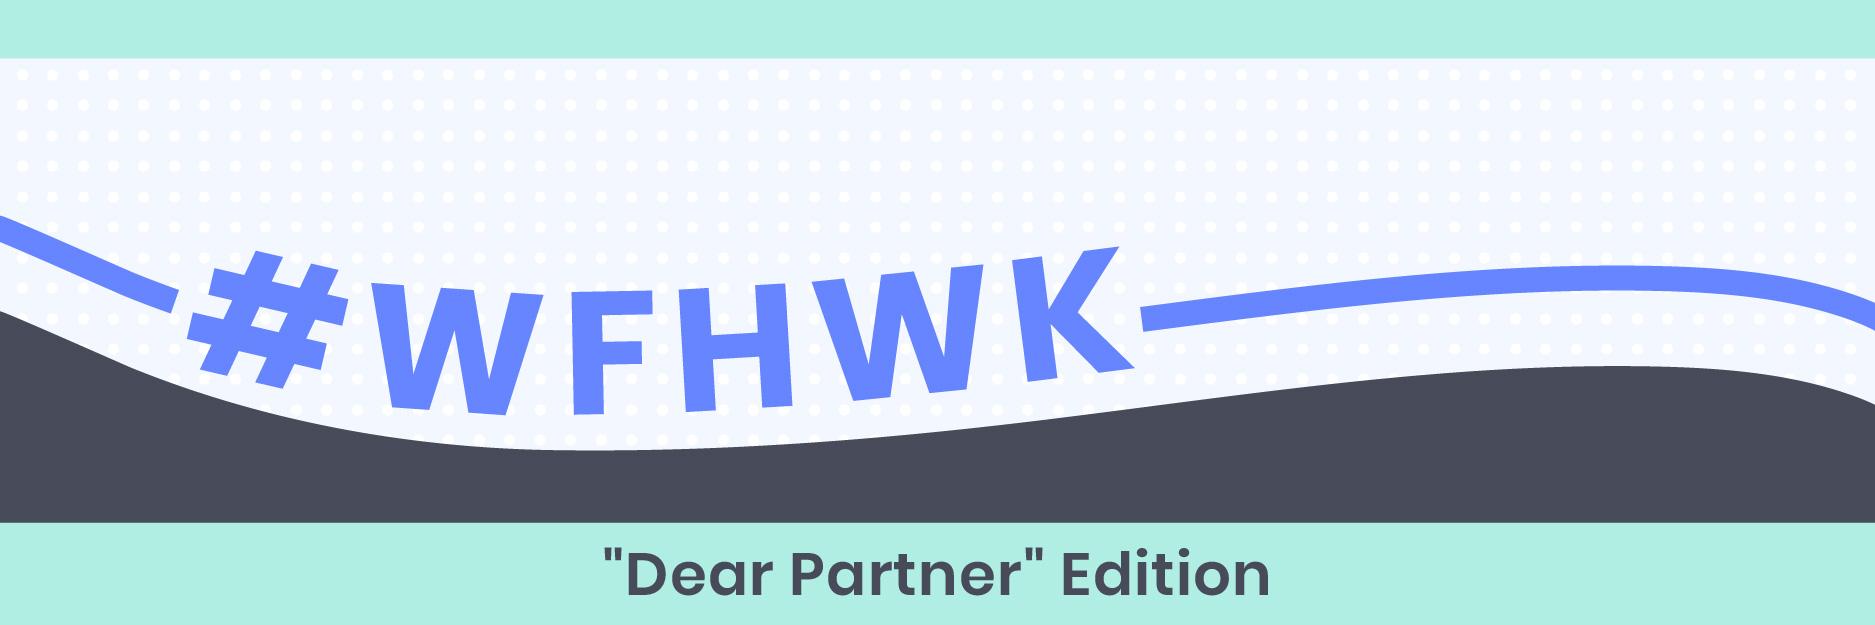 #WFHWK: All Hands On Deck